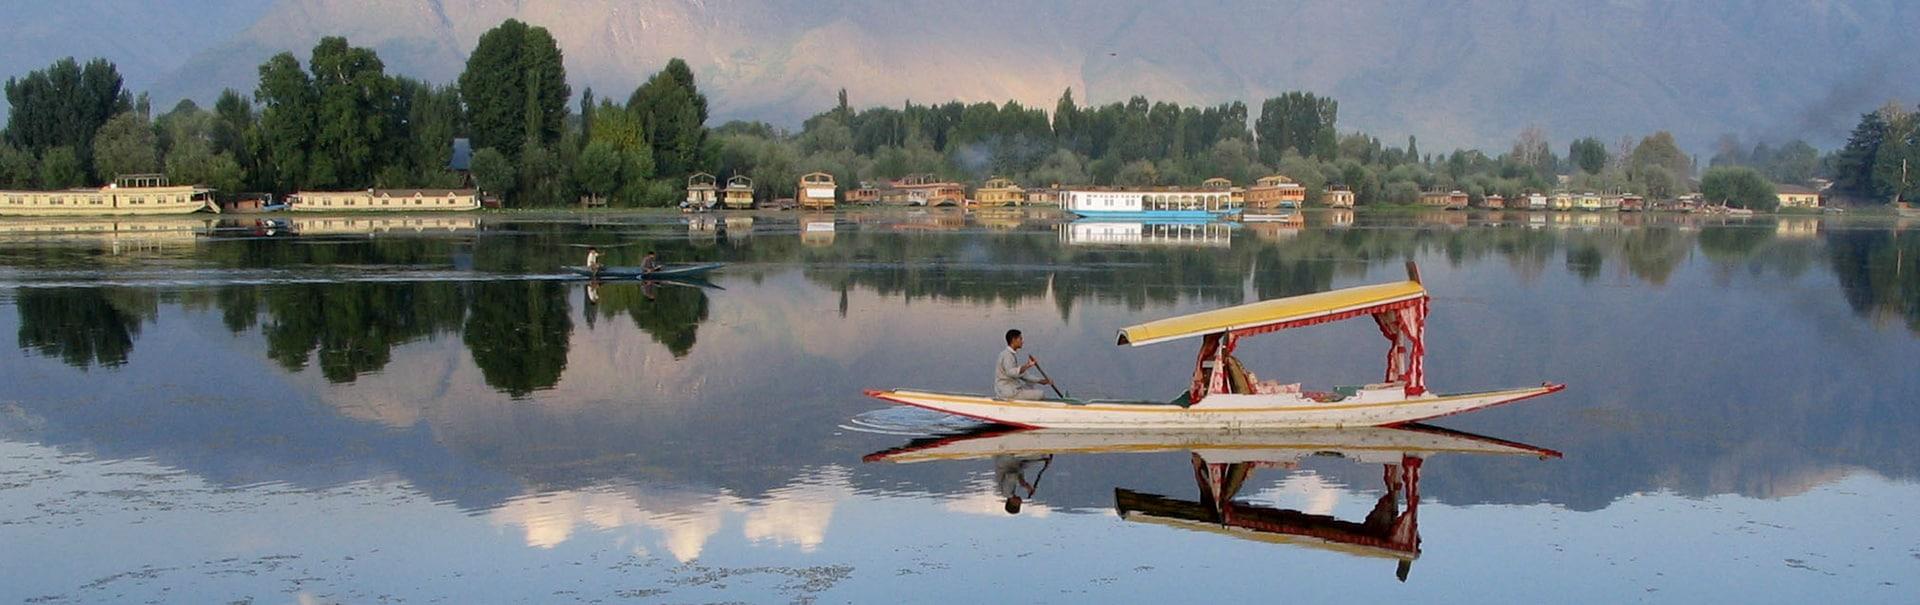 Srinagar with Lemon Tree hotel (SHJK10) Banner